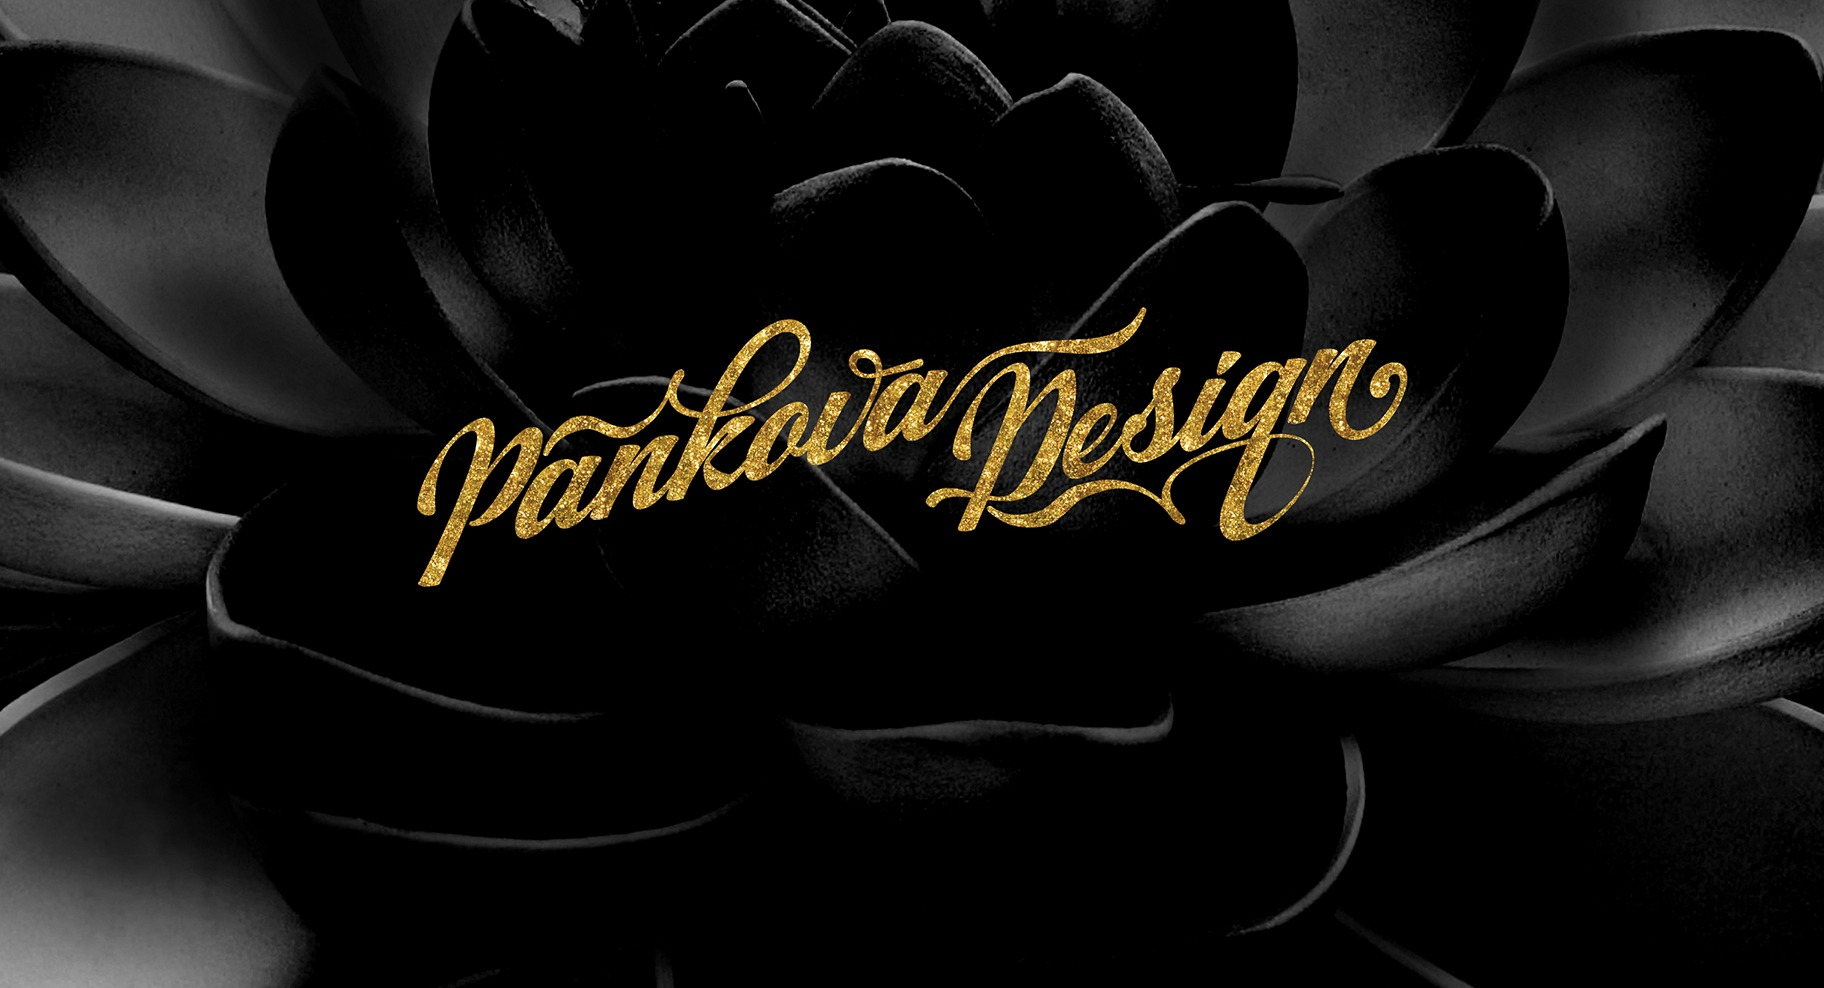 Pankova Design